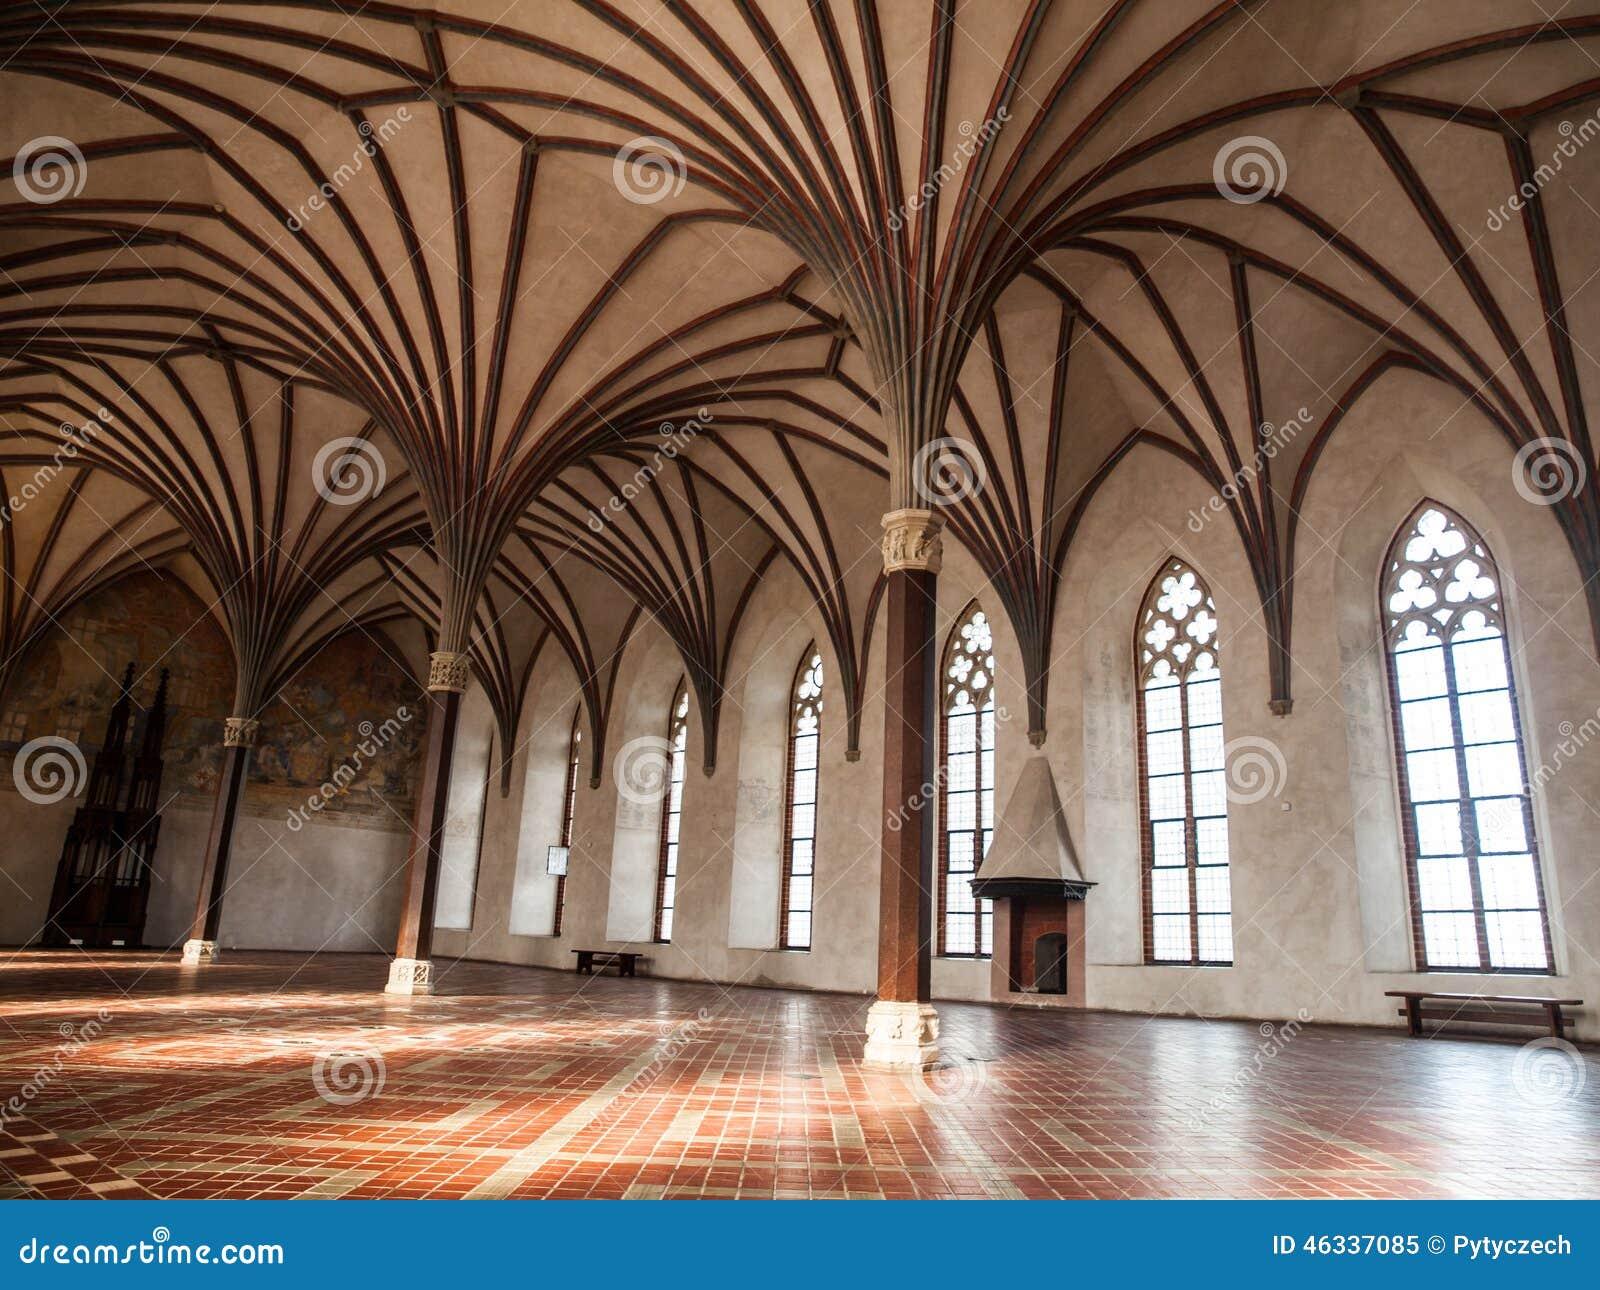 Gothic 2 Windows 10